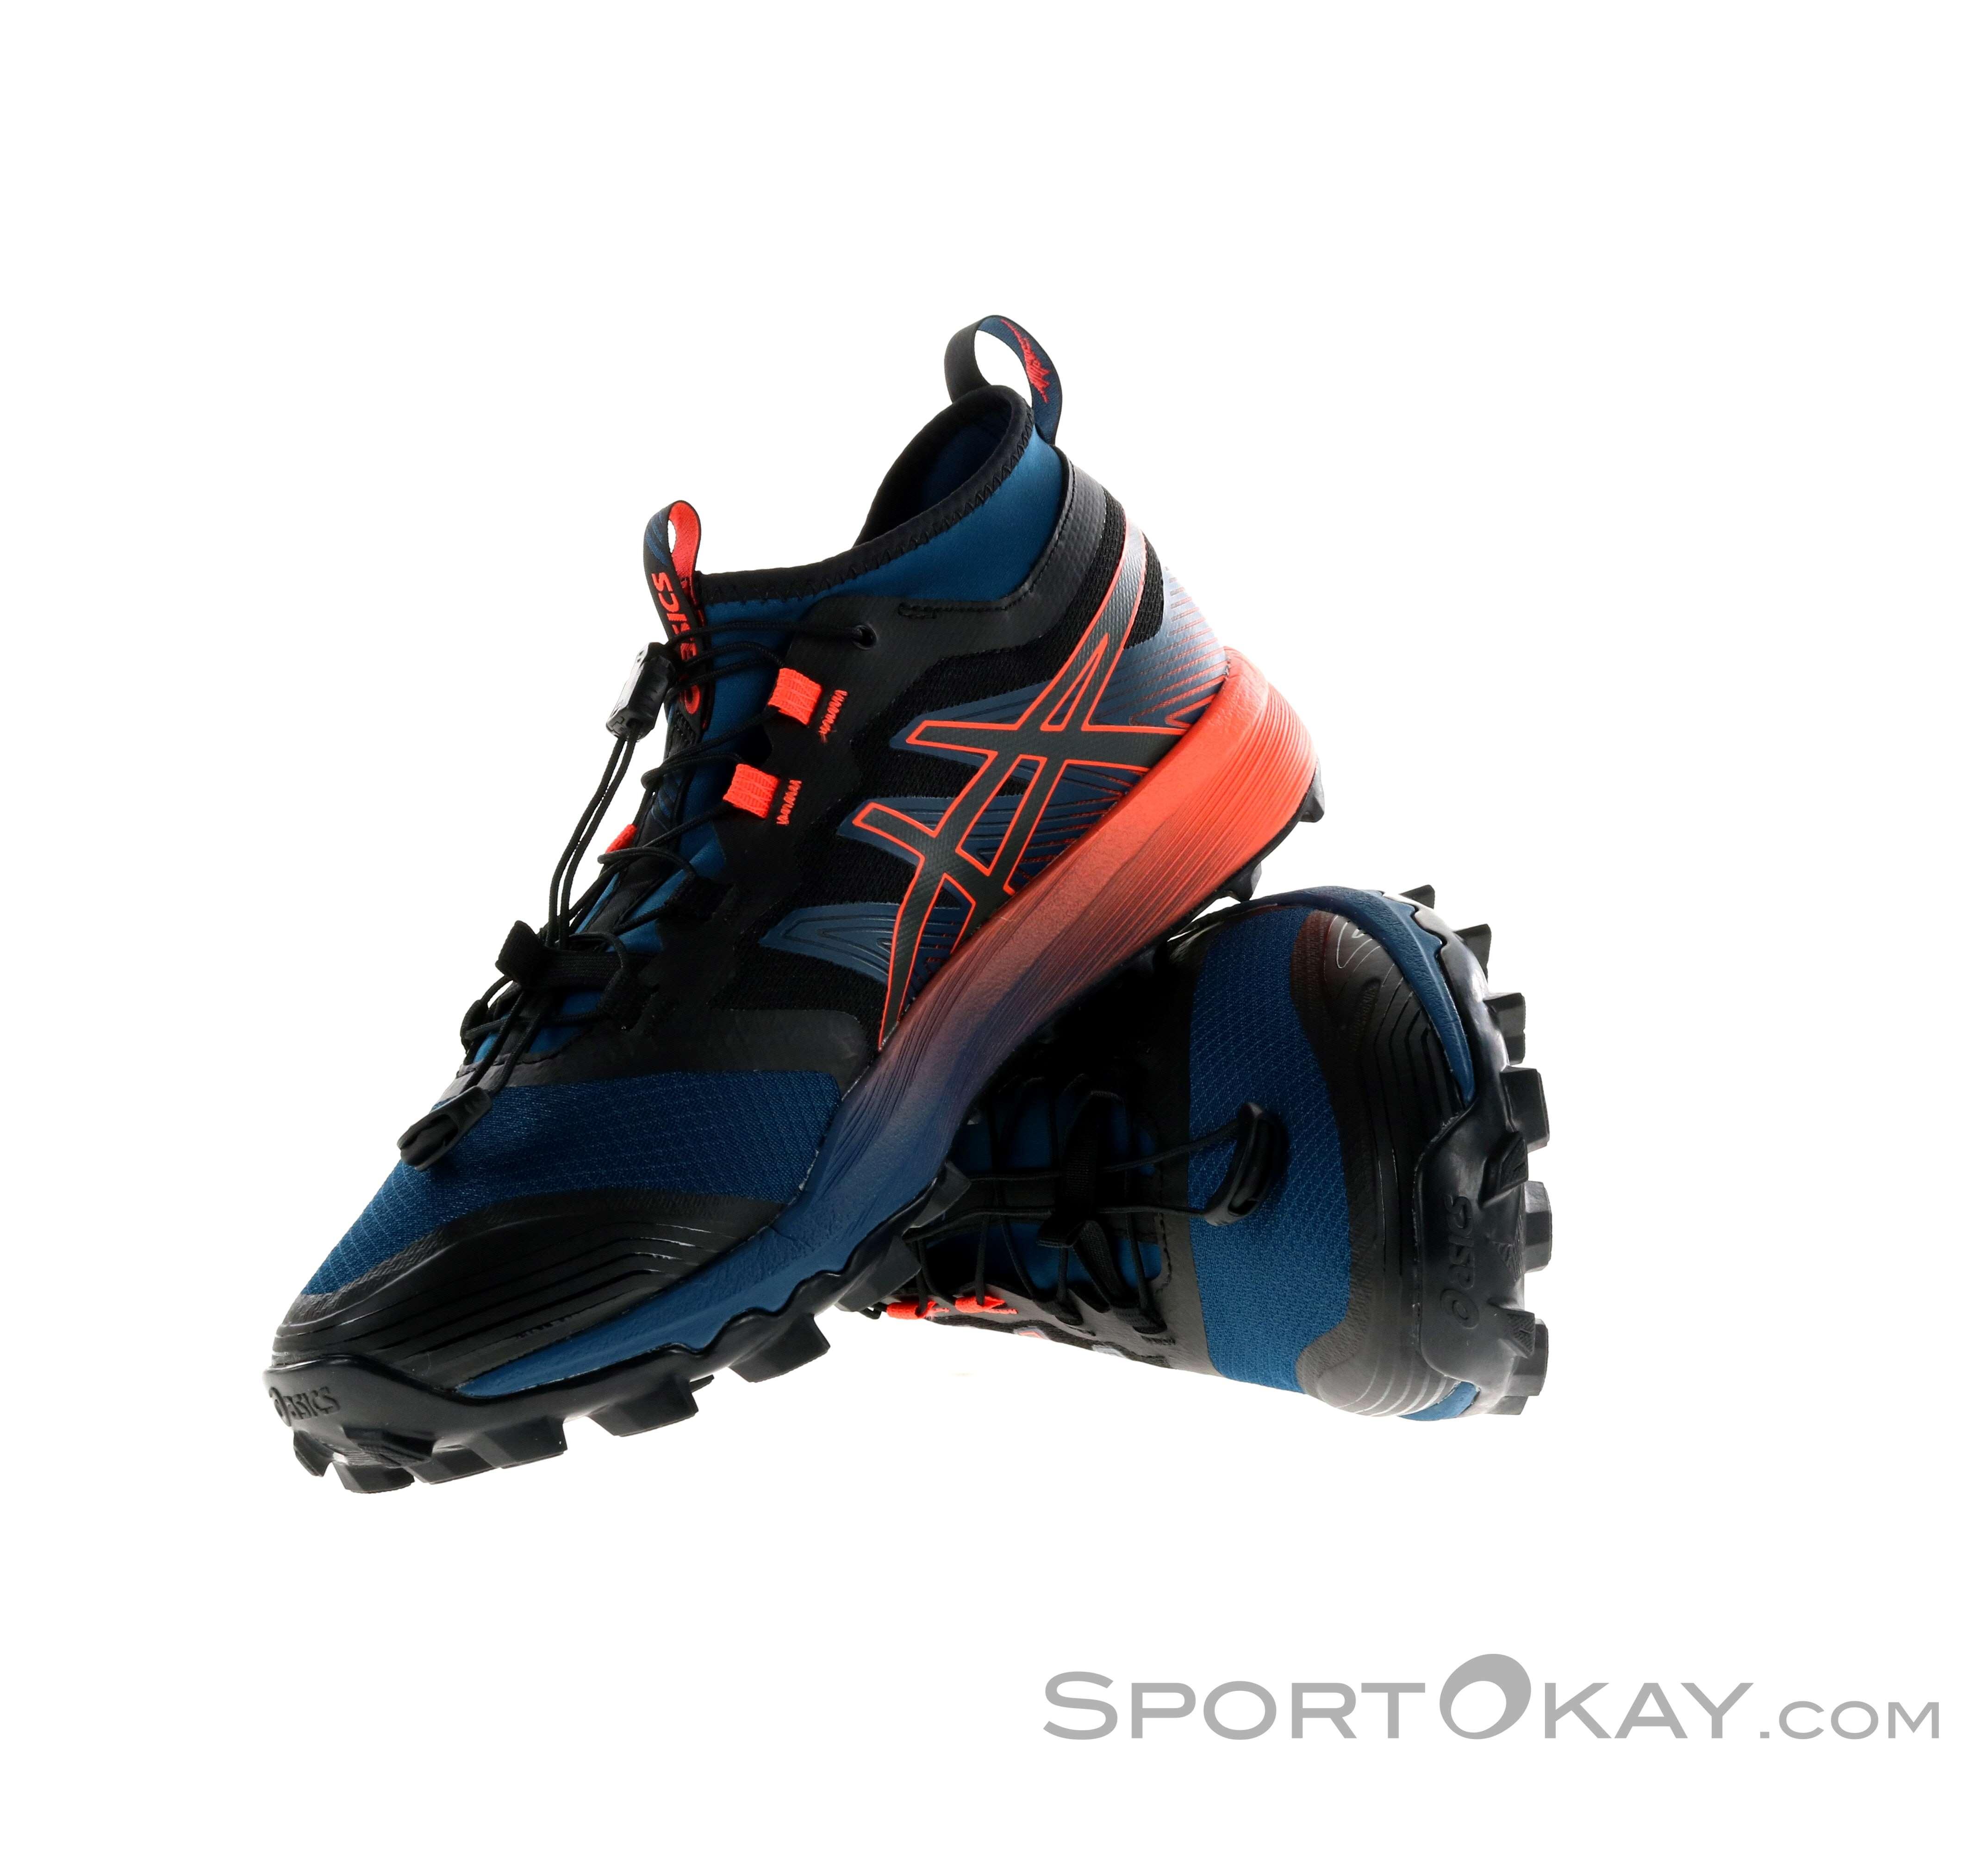 Asics Fujitrabuco Pro Mens Trail Running Shoes Trail